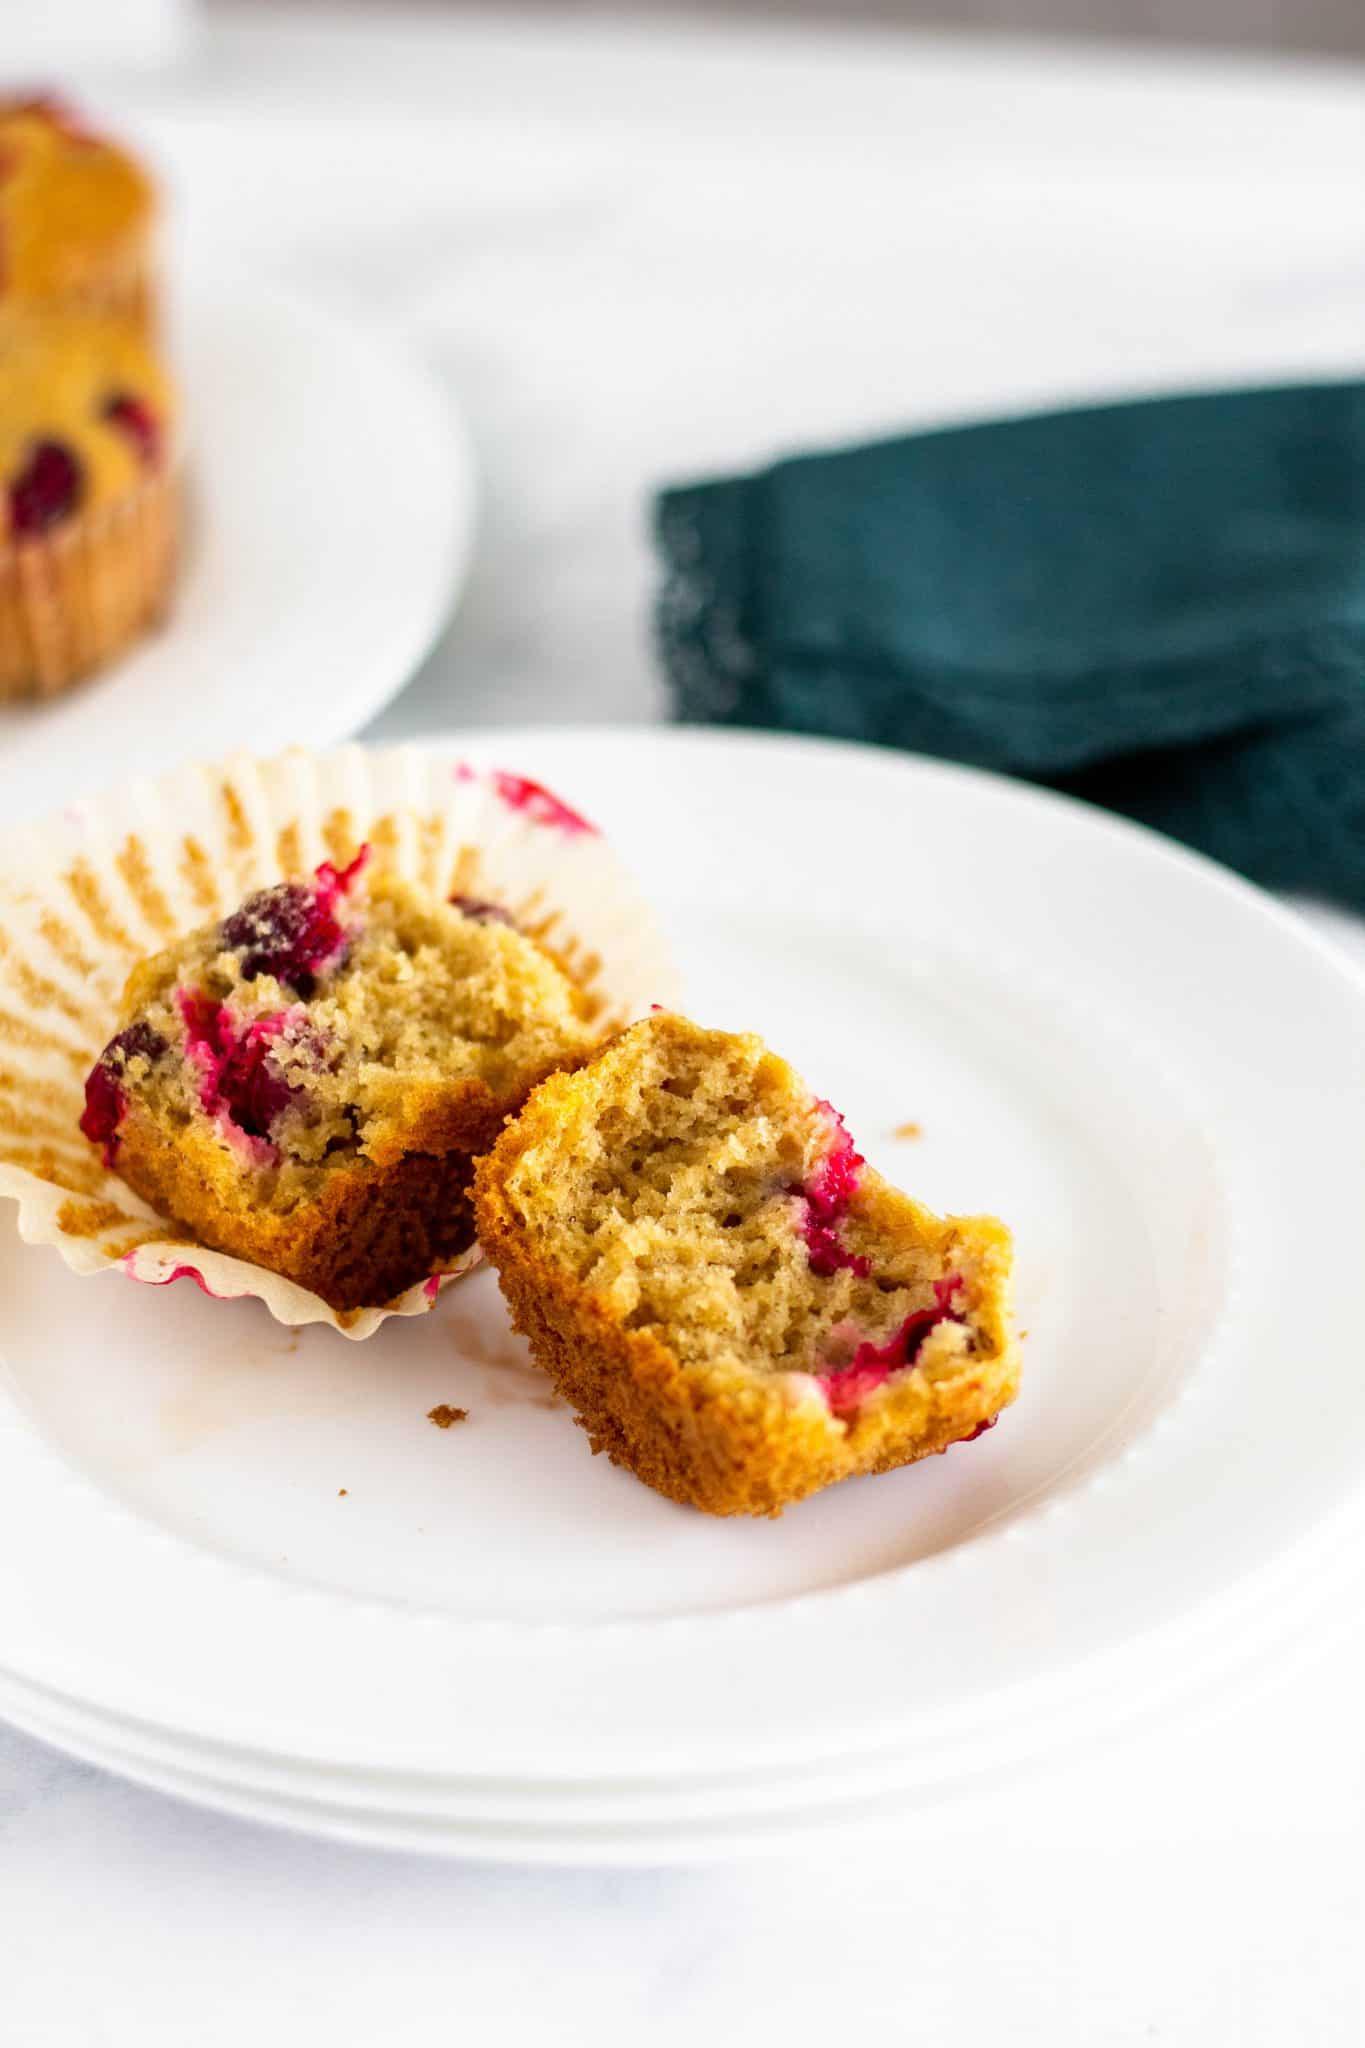 Low FODMAP Cranberry Orange Muffins - Tara Rochford Nutrition #lowfodmapmuffins #lowfodmapbaking